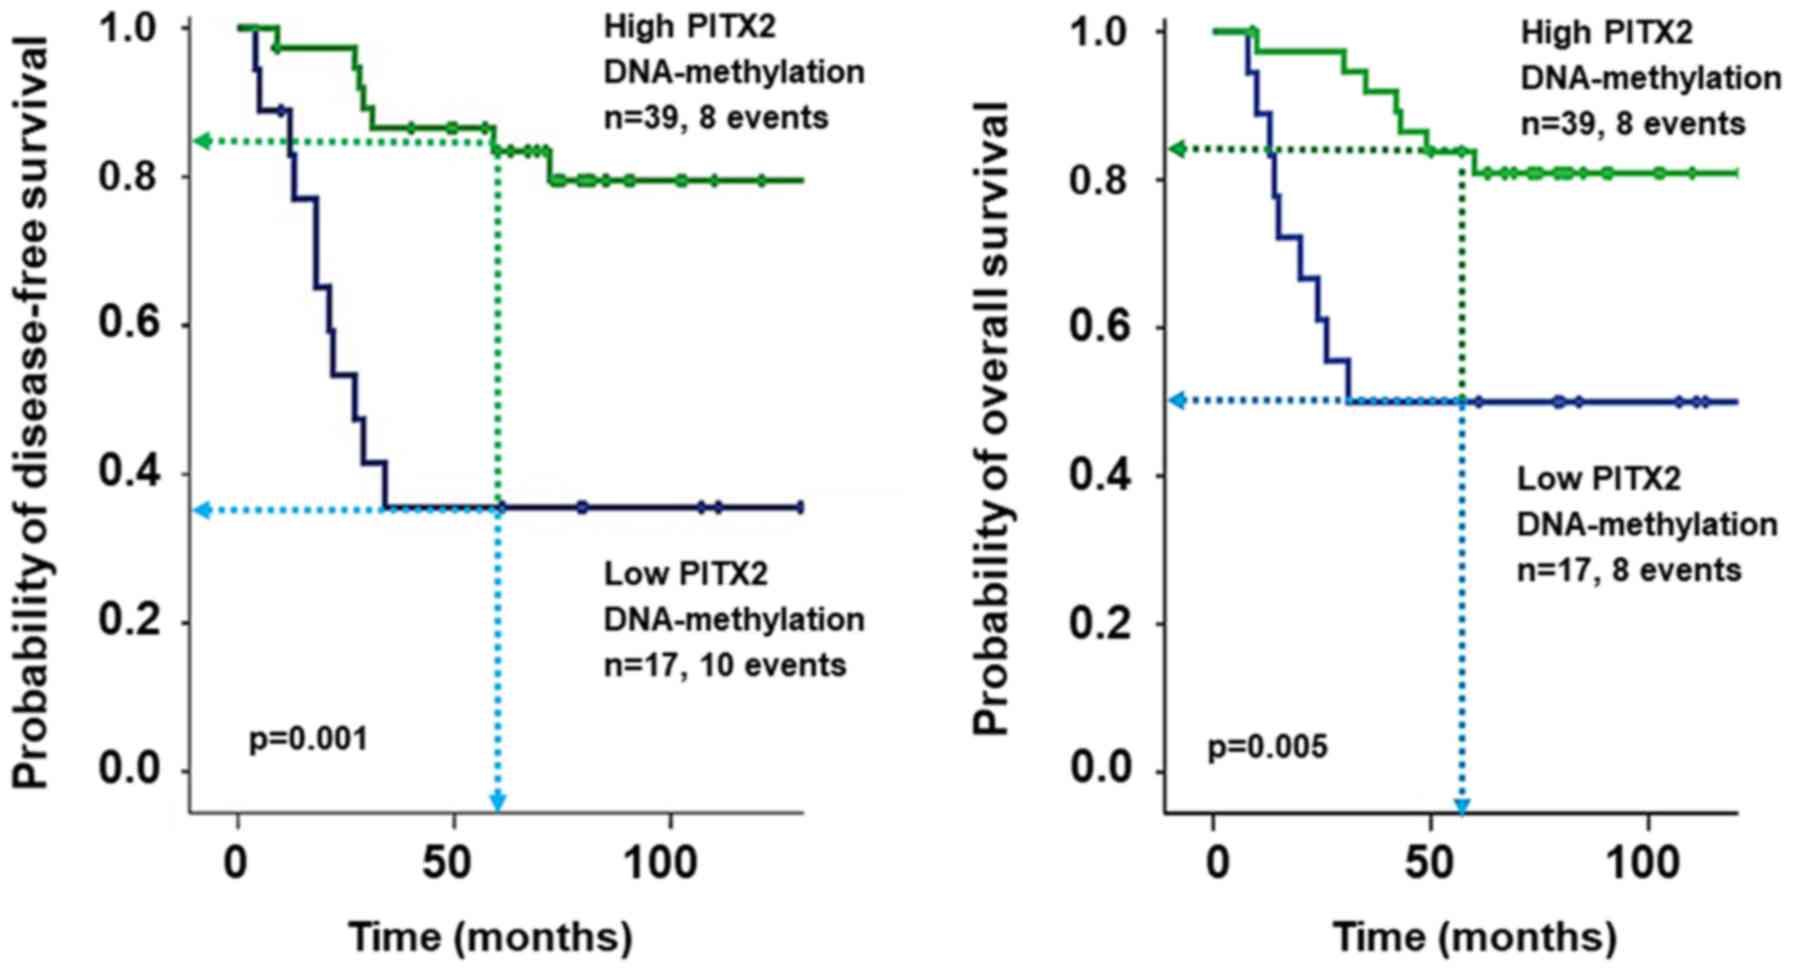 PITX2 DNA-methylation predicts response to anthracycline-based